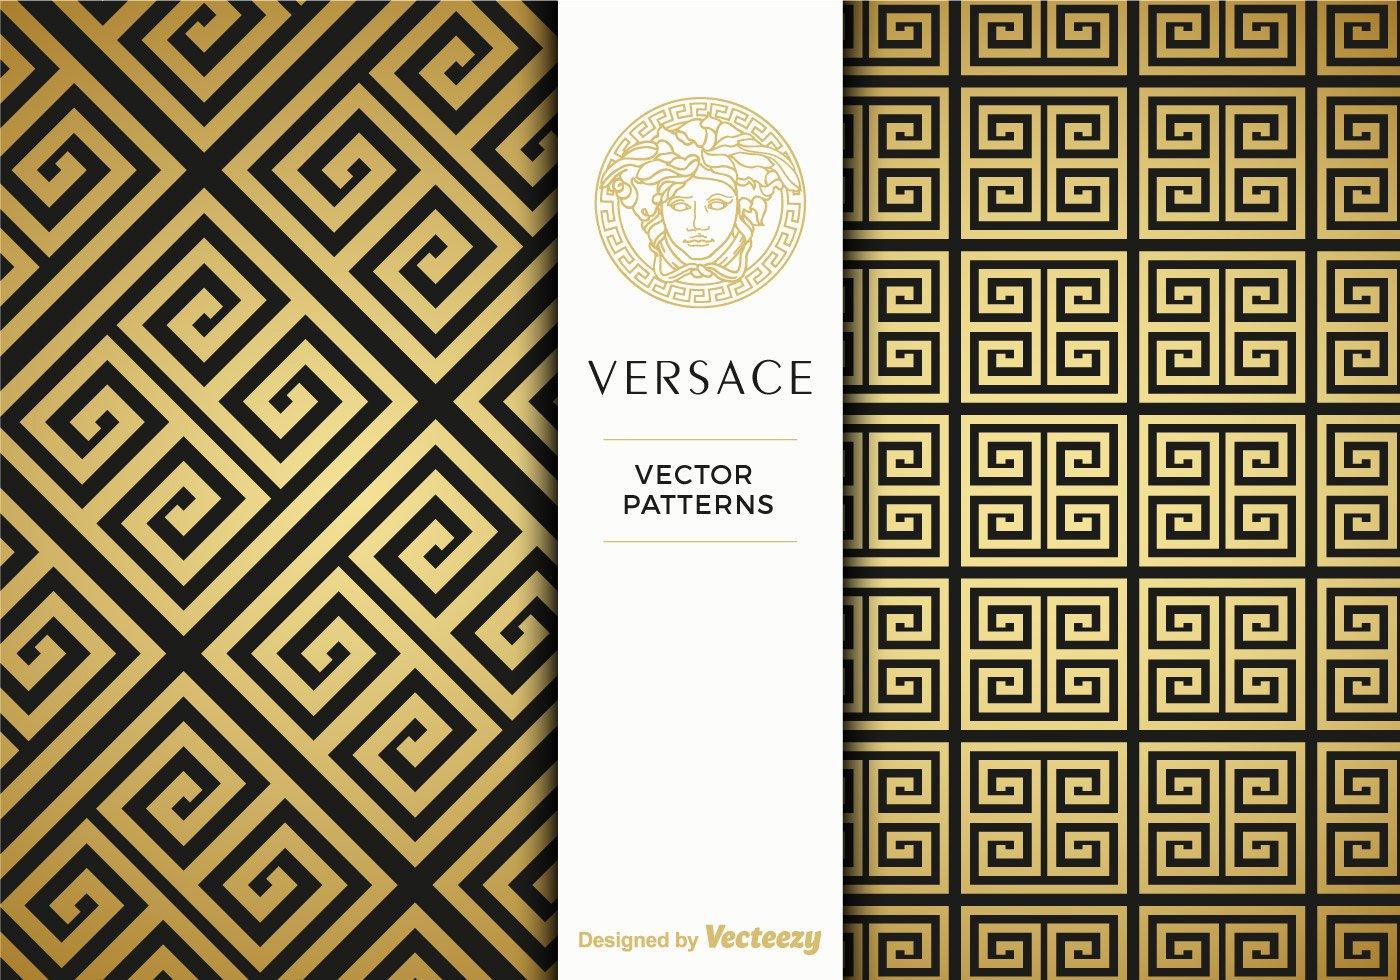 Greek Key Pattern Template Inspirational Free Versace Golden Vector Patterns Download Free Vector